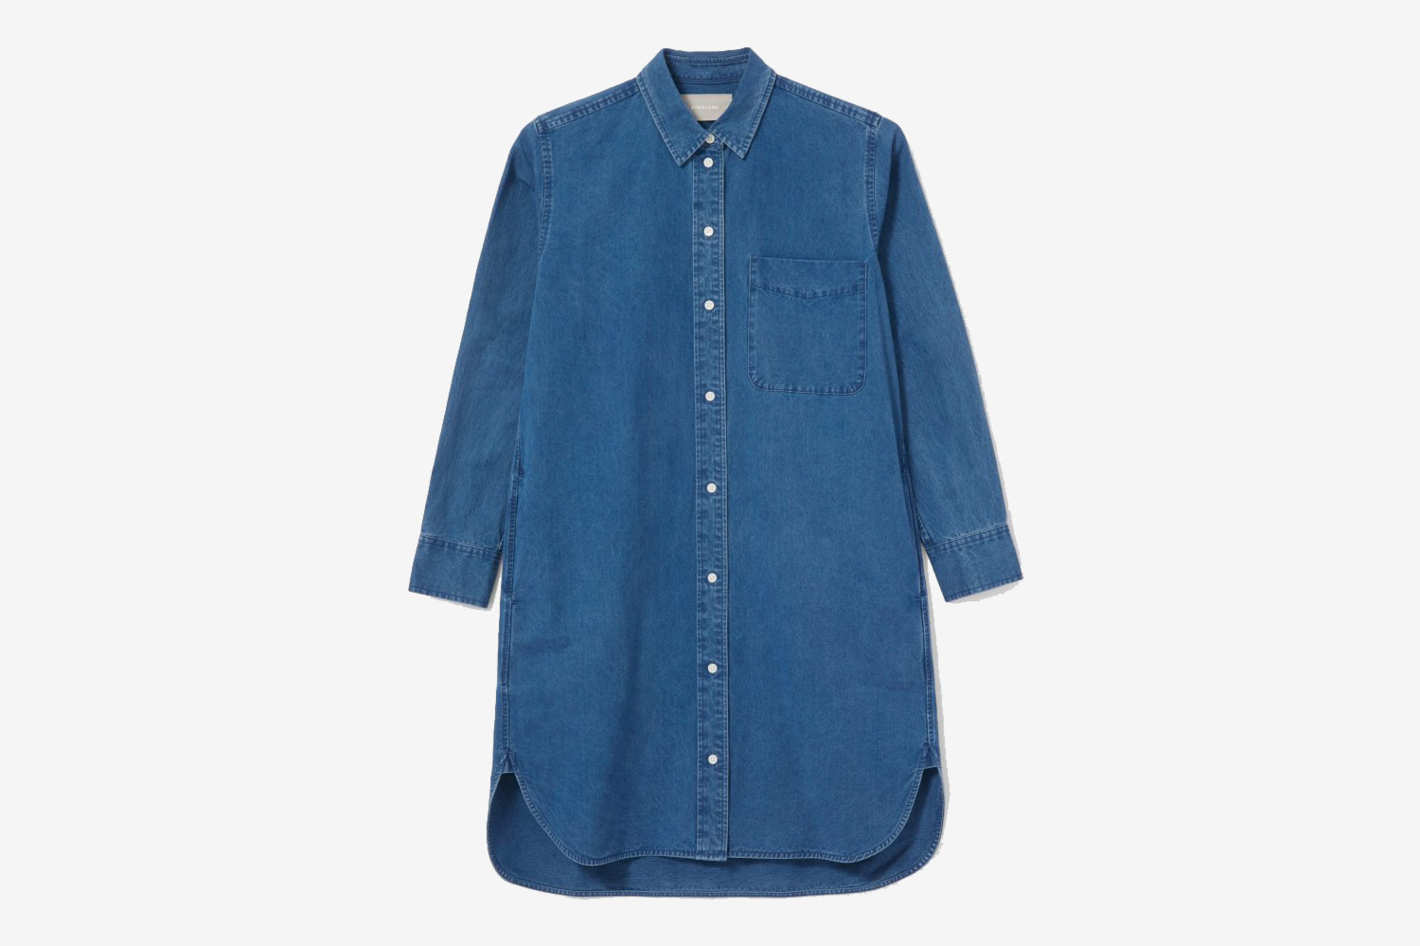 Everlane The Jean Shirtdress